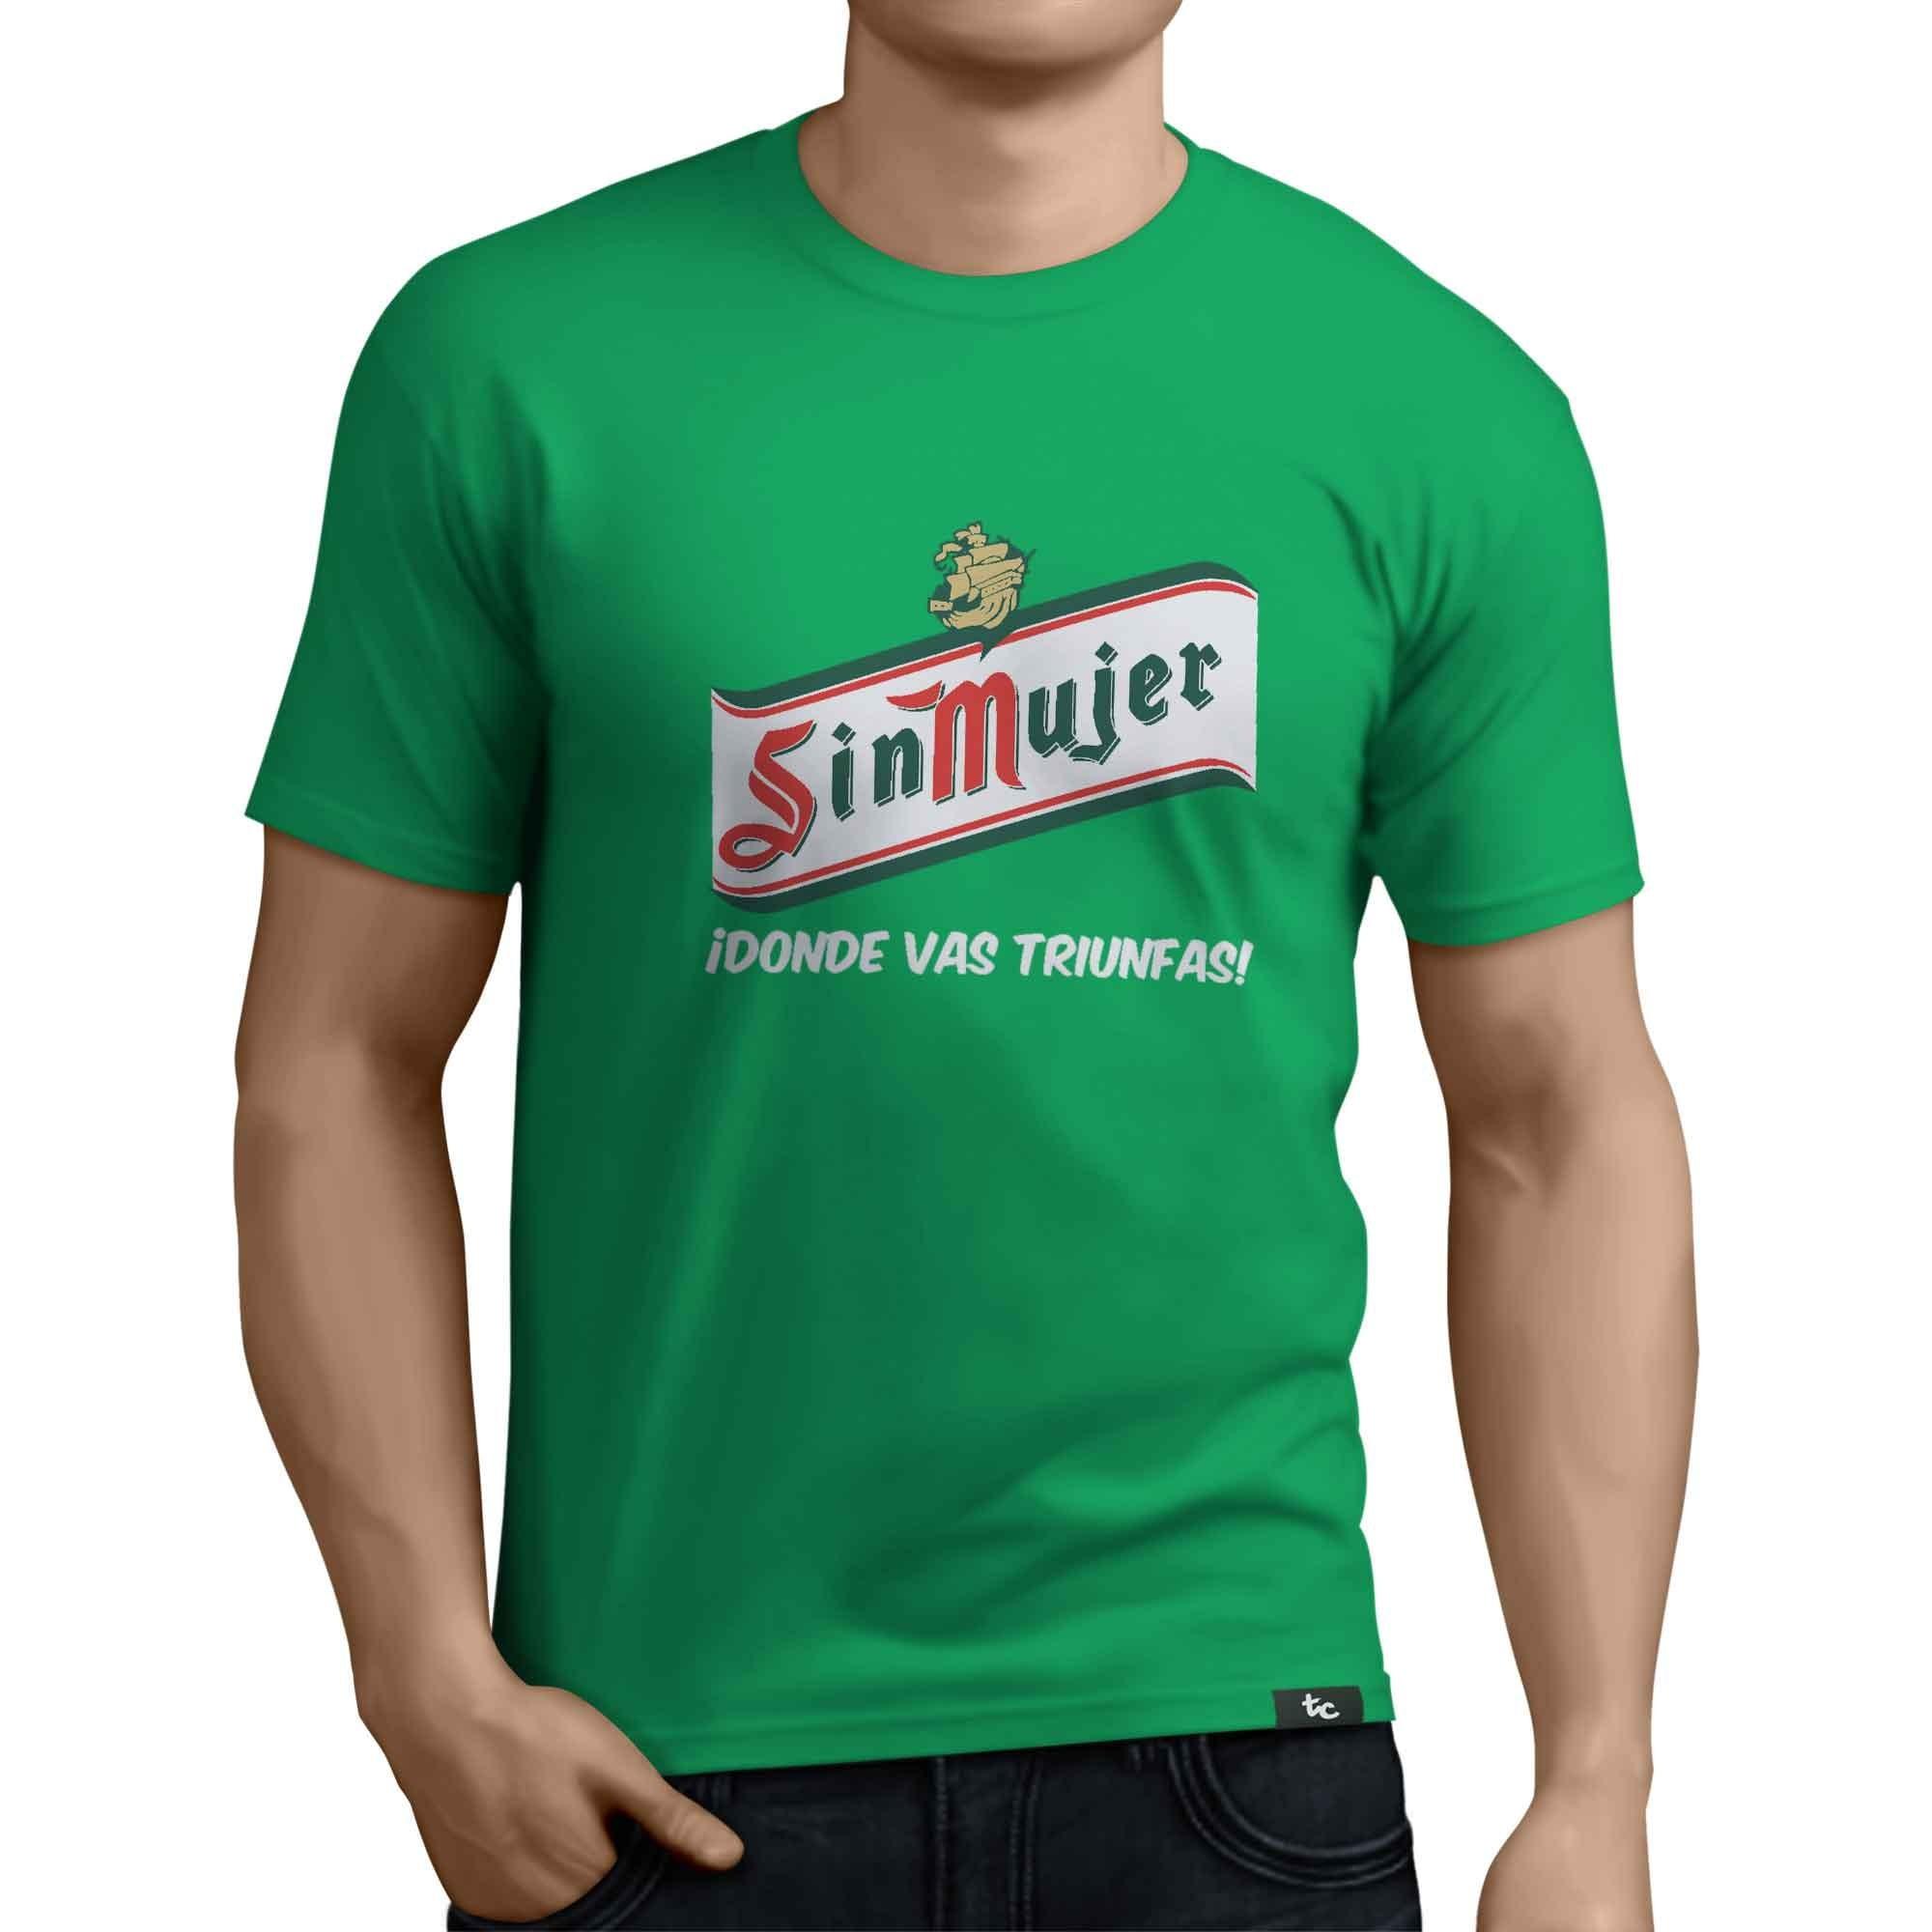 060e8a2fa502c Frases para camisetas de peñas personalizadas - BF Bordados